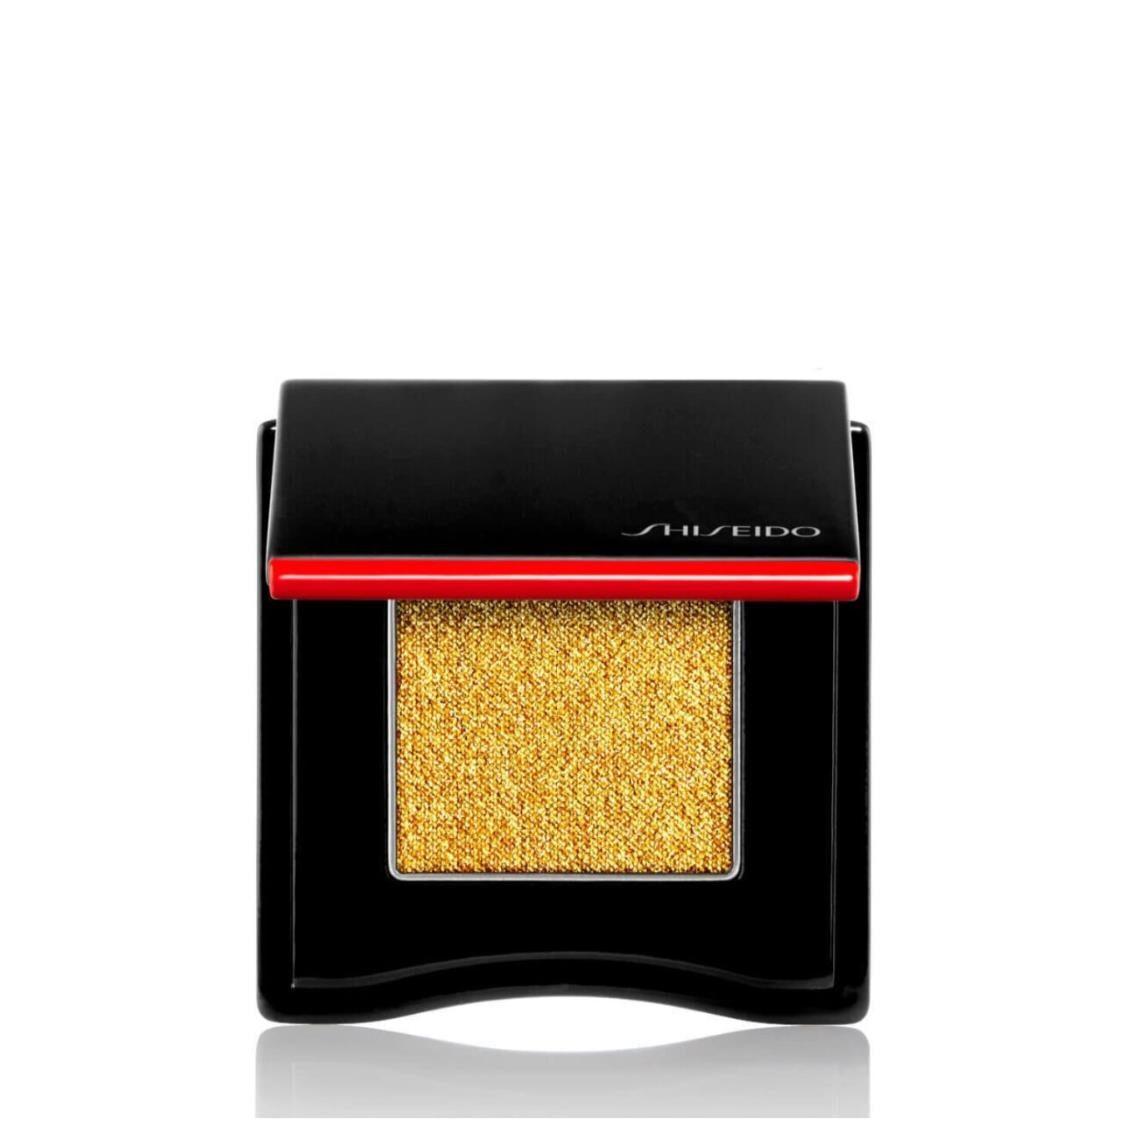 Shiseido POP PowderGel Eye Shadow 13 Kan-Kan Gold